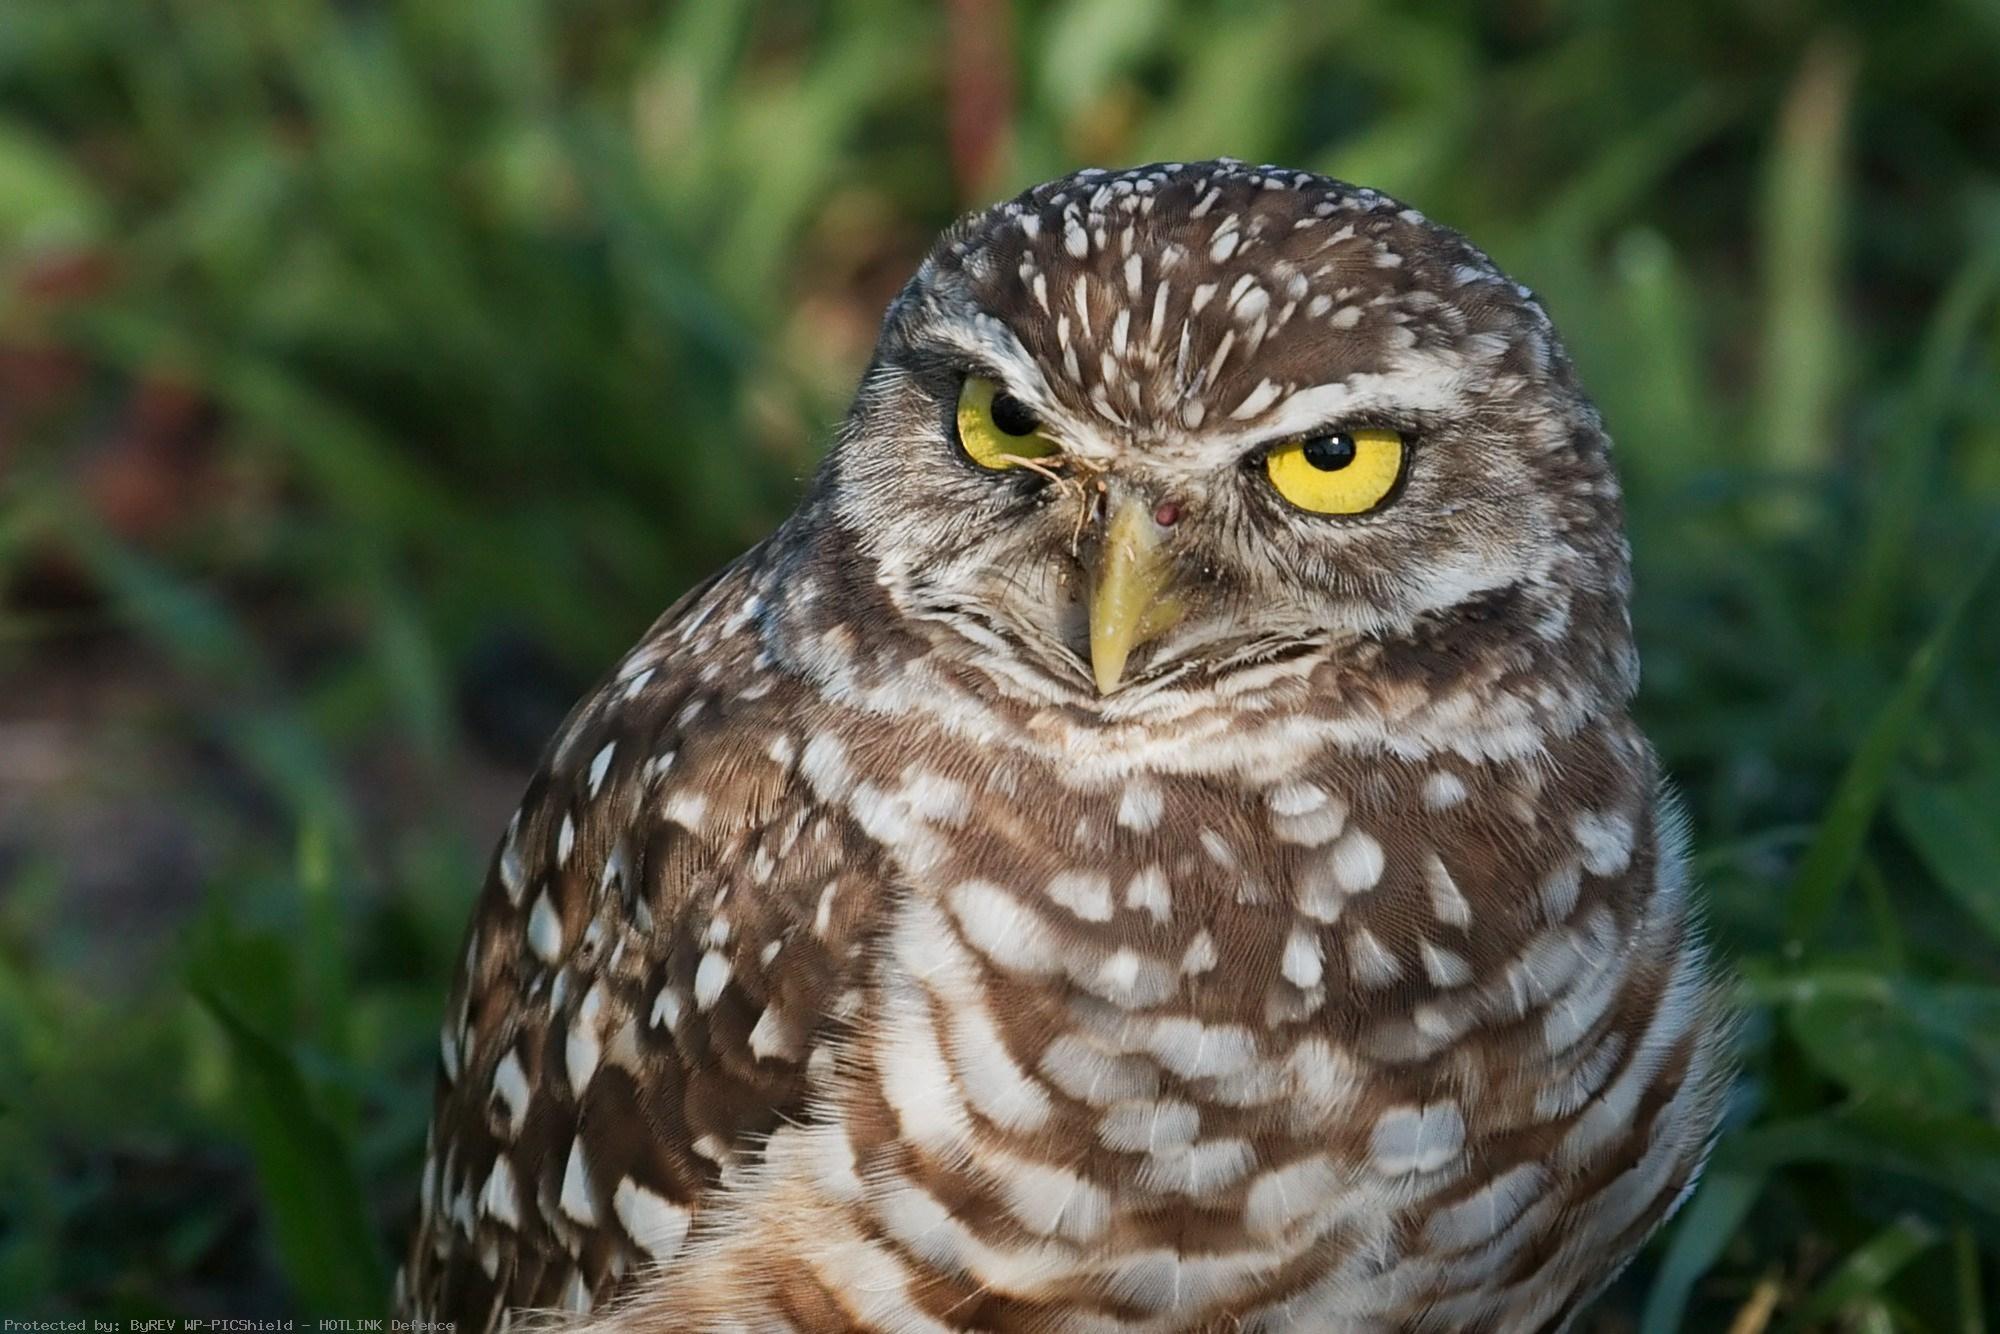 owl-hd-1080p-high-quality-wallpaper-wp3808970